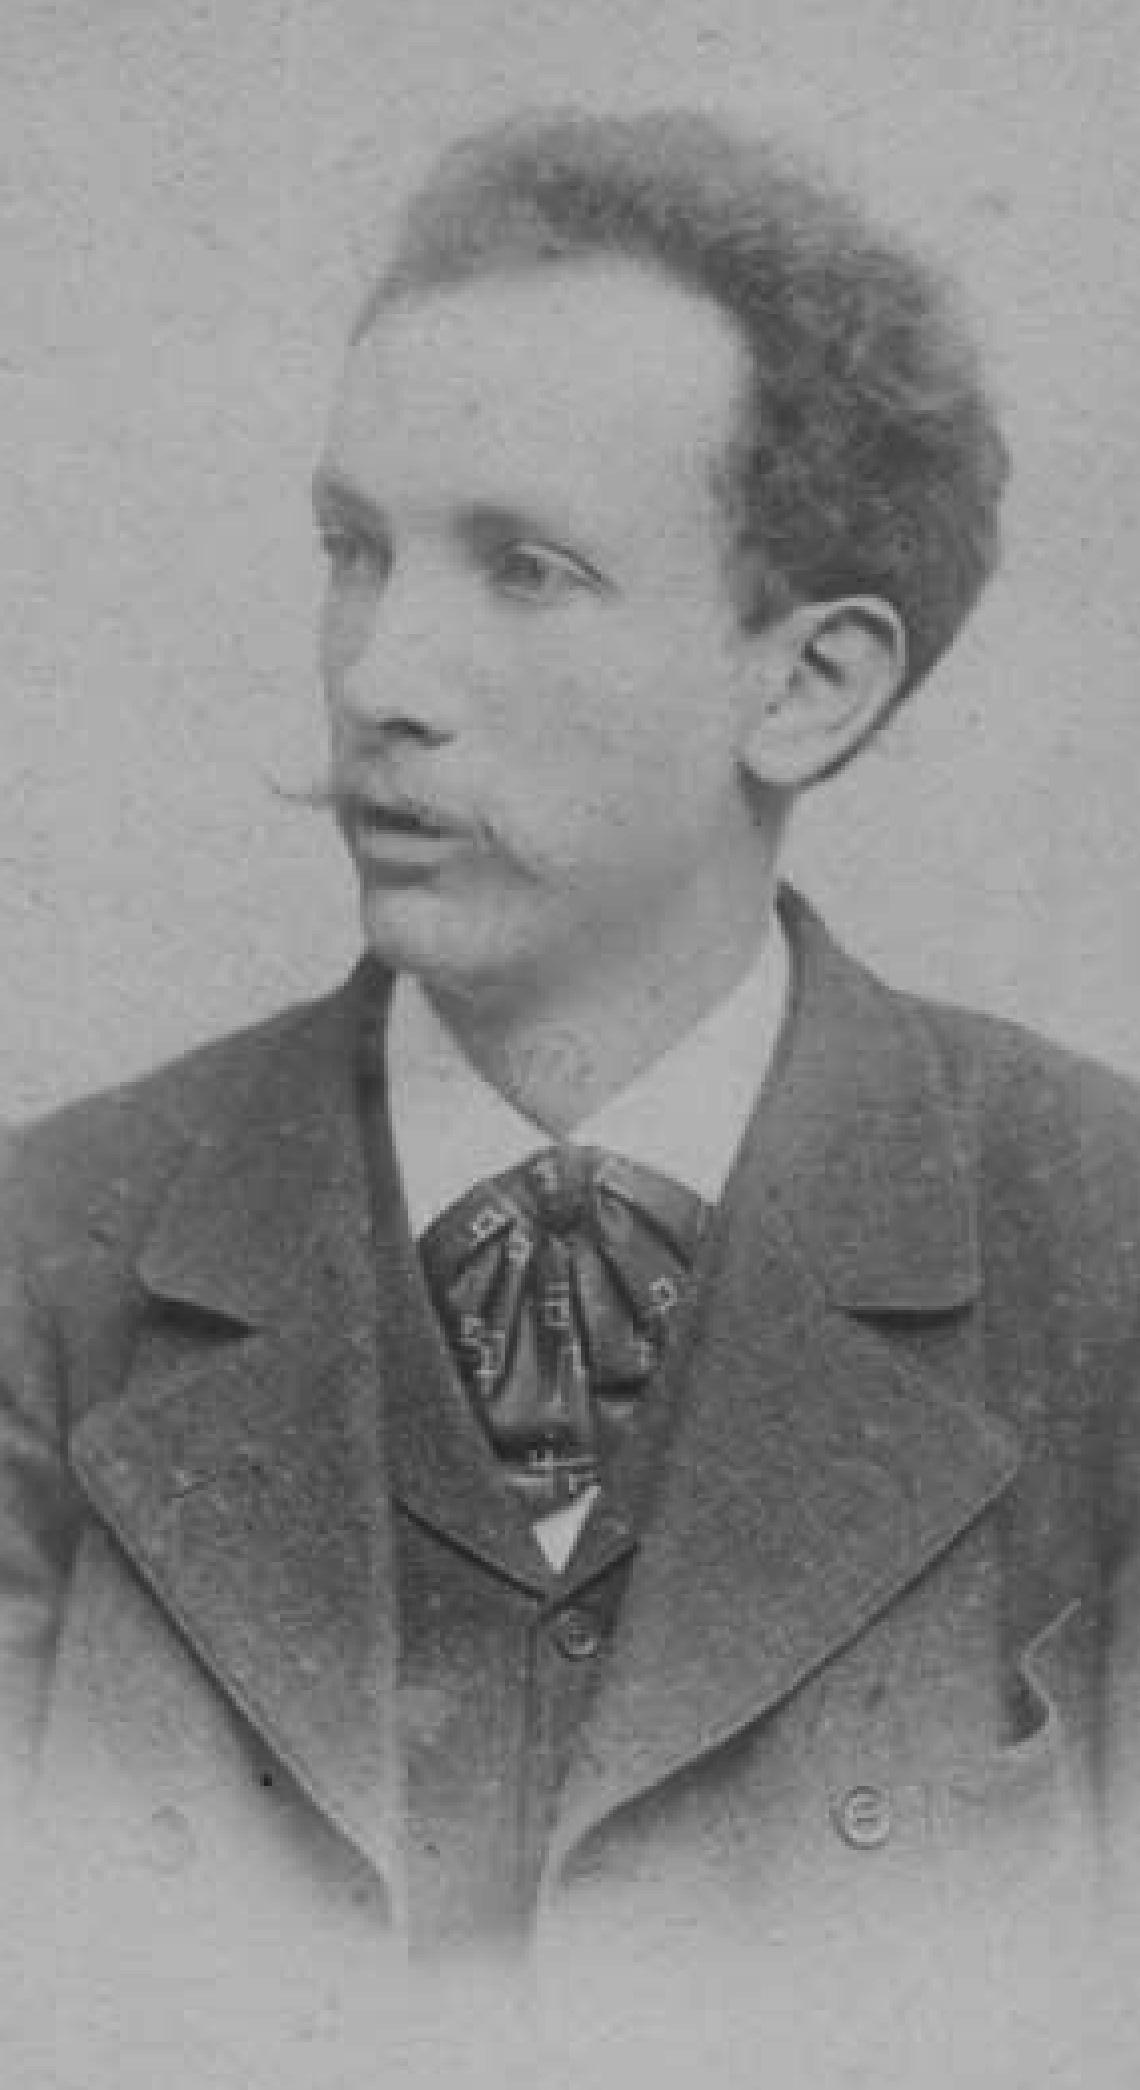 Richard Strauss vers 1890, cliquer pour une vue agrandie